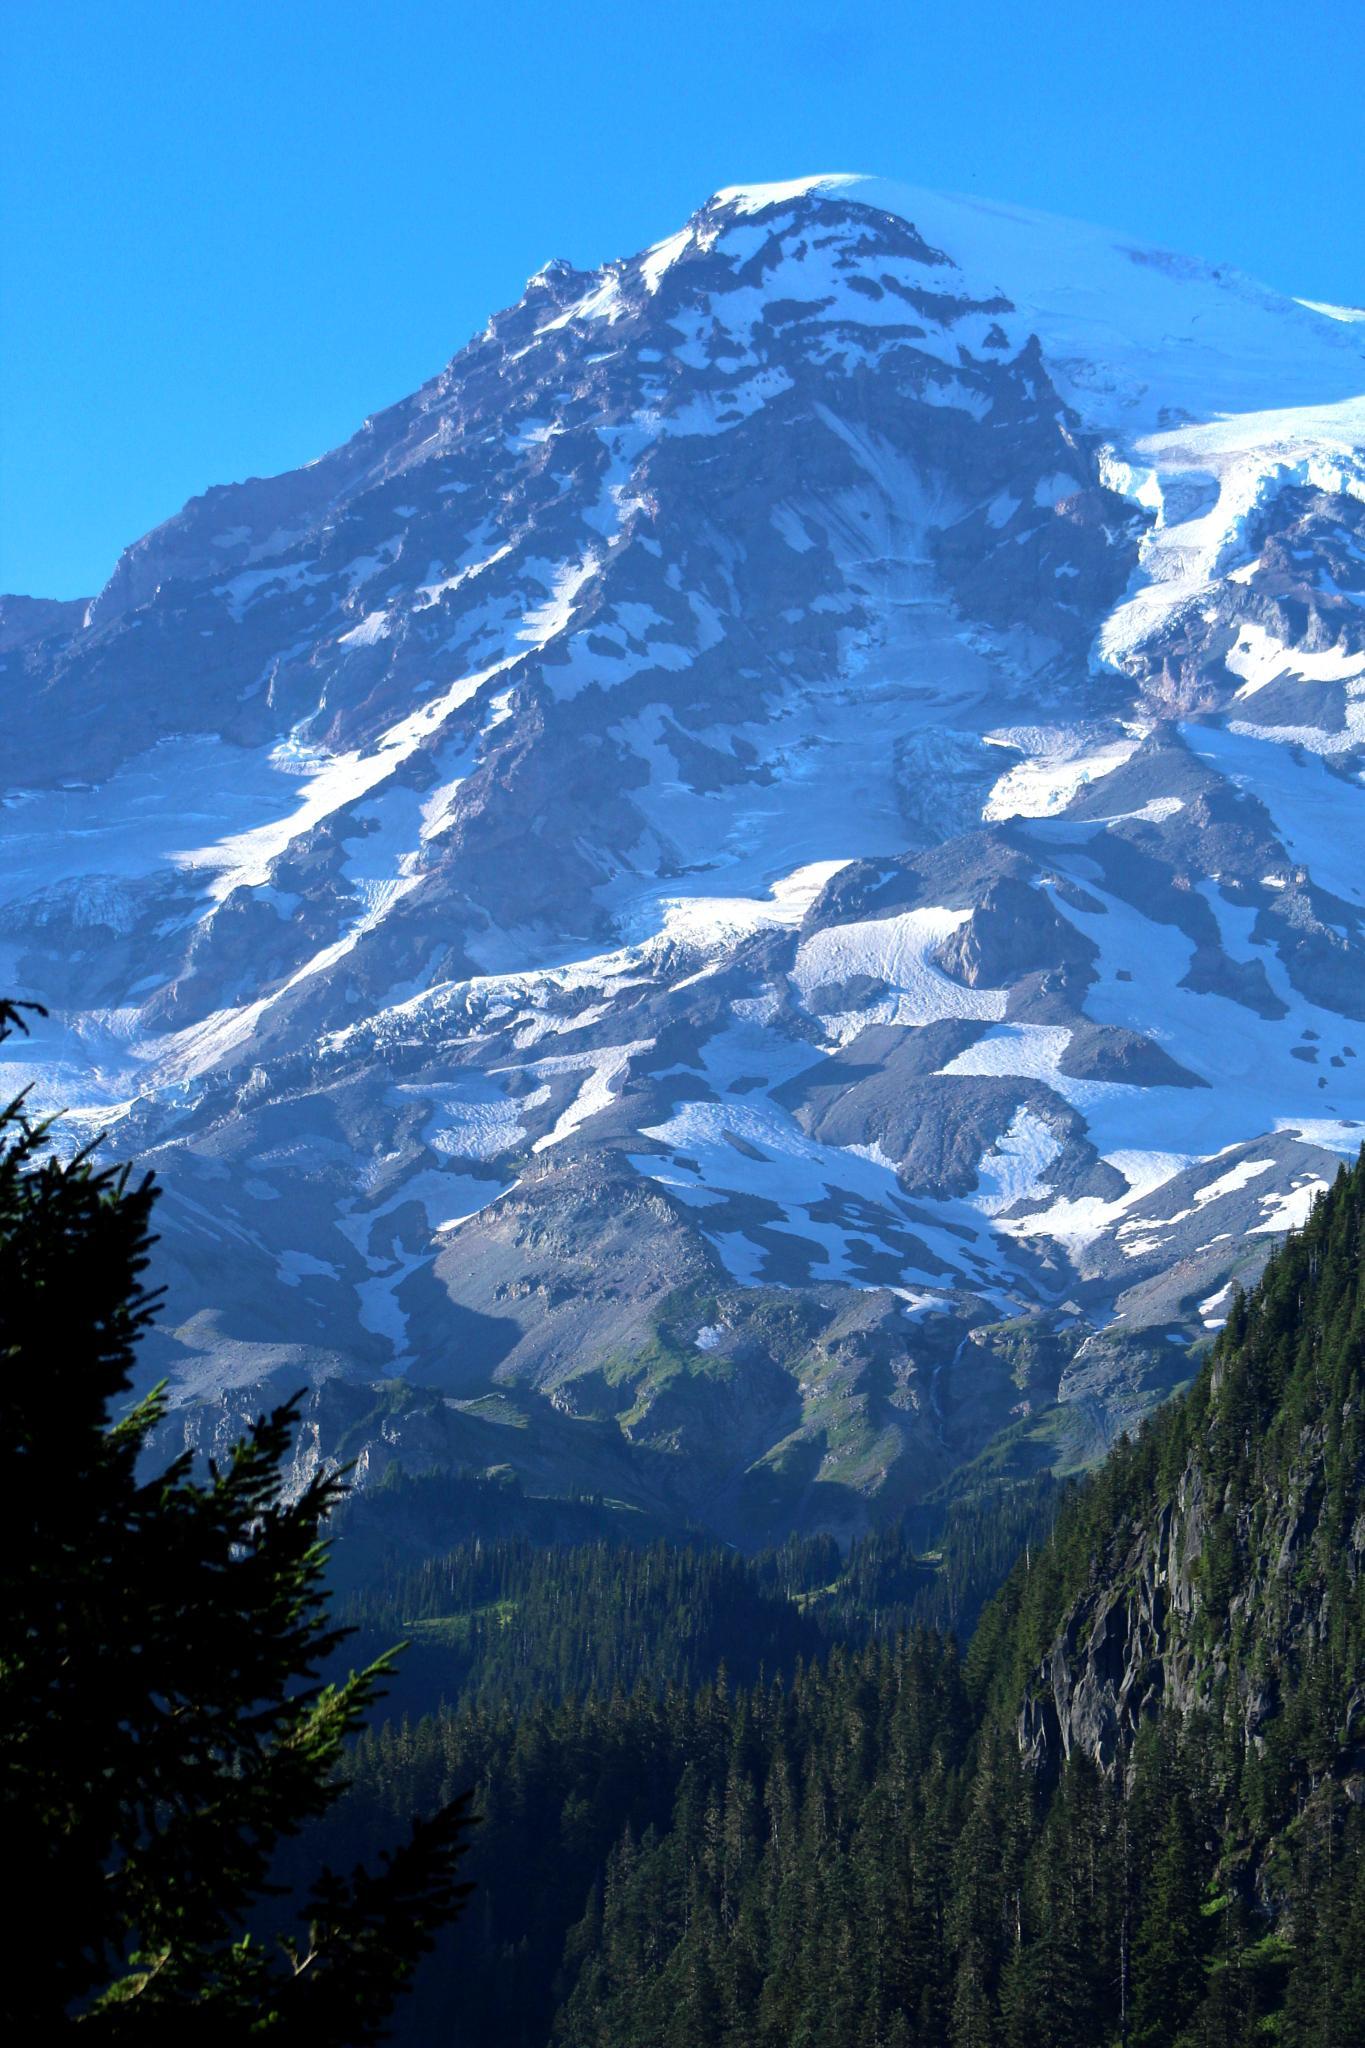 Mount Rainier by JosephParker